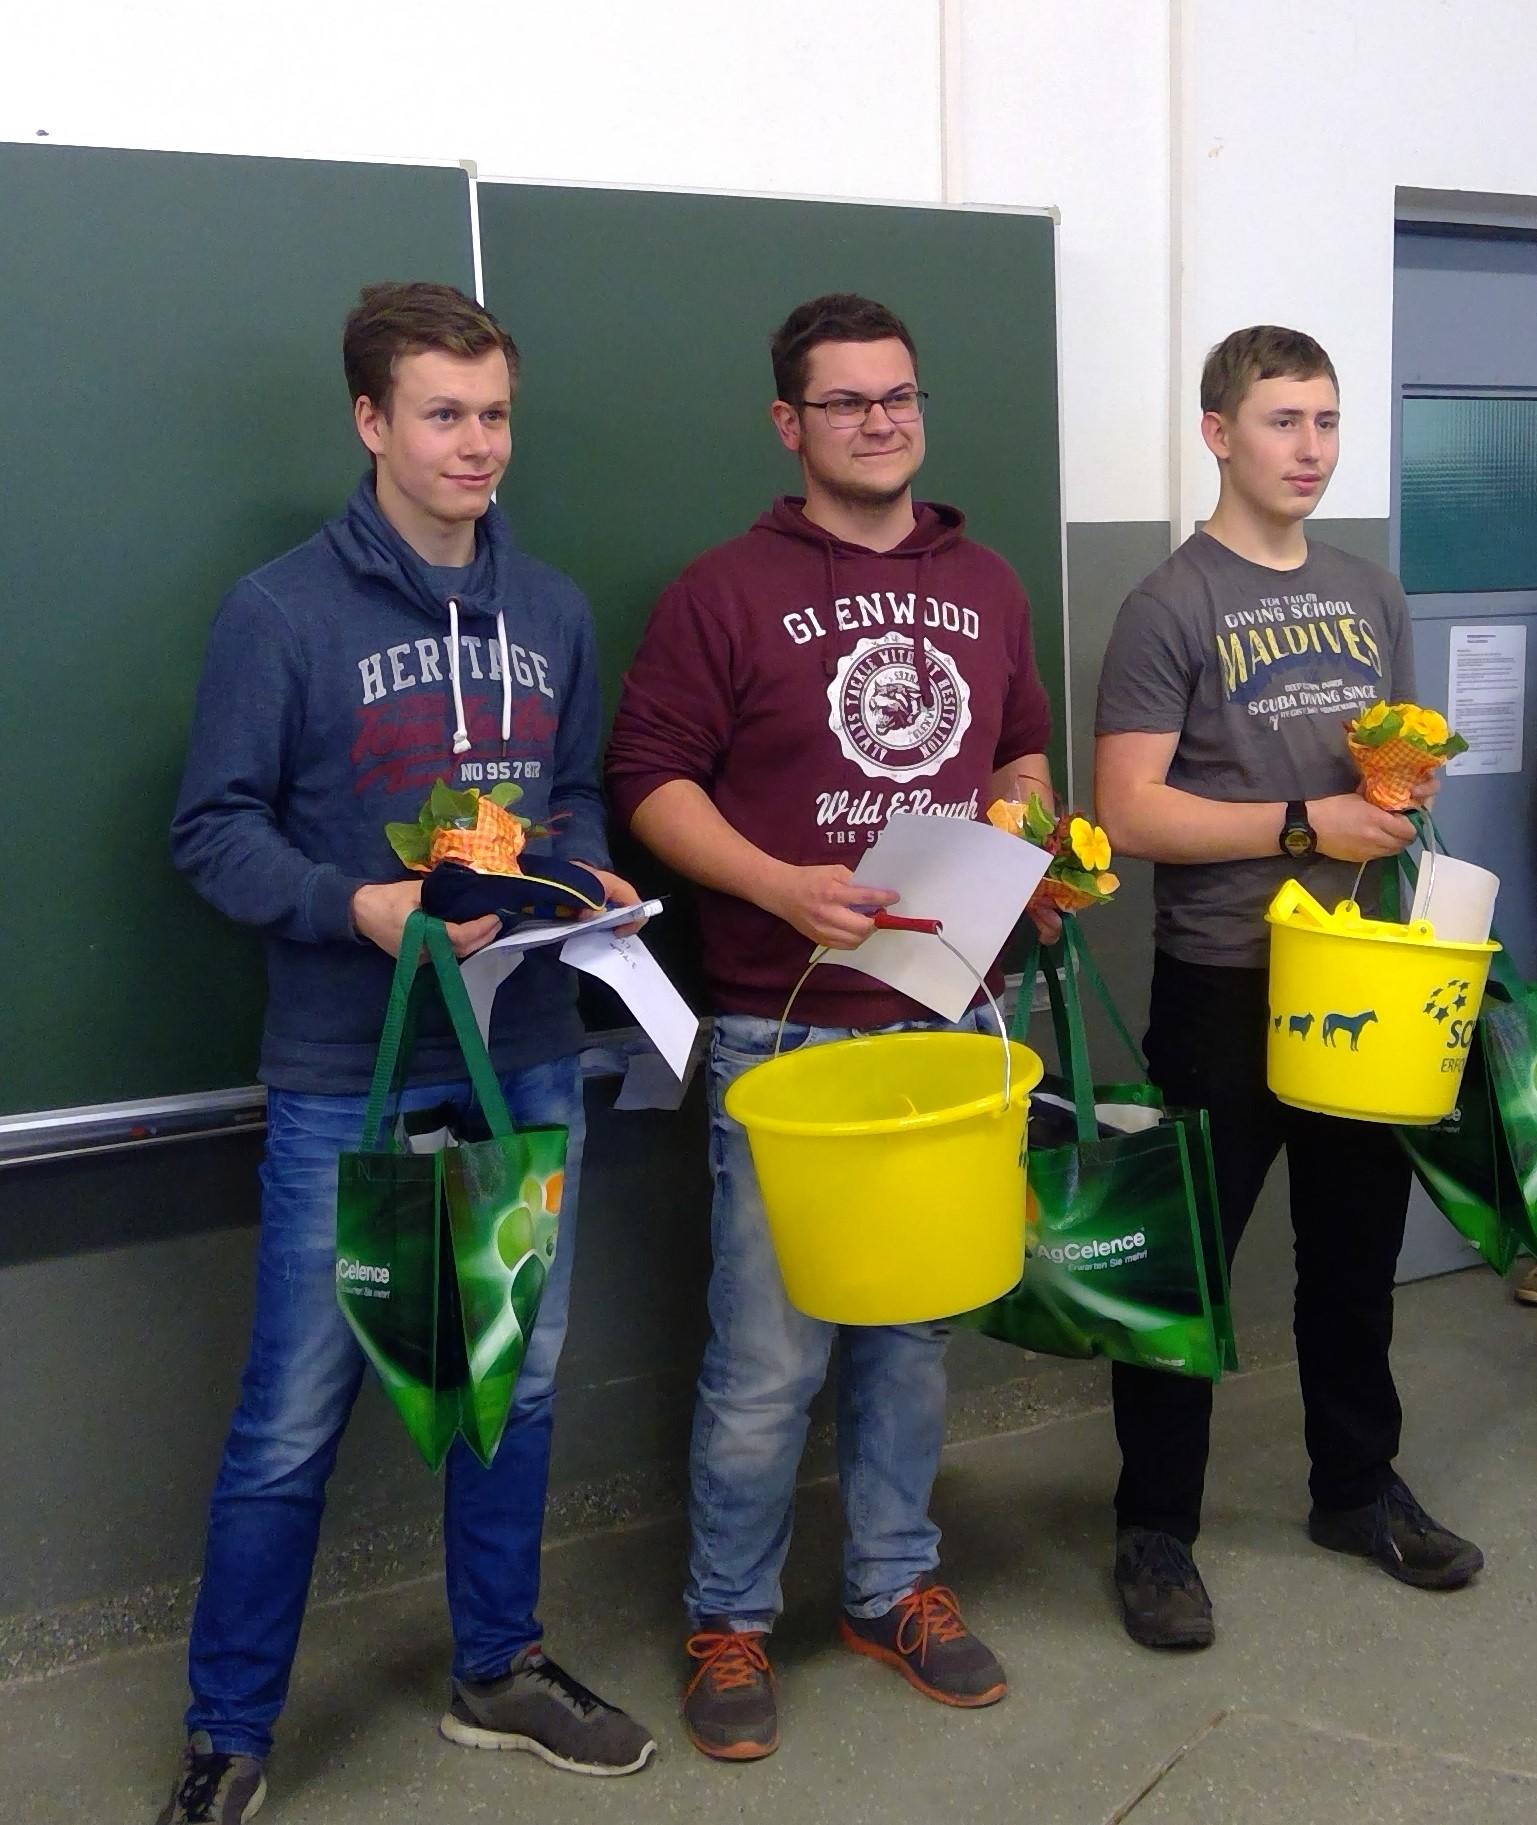 Paul Hartmann, Michael Peise und Martin Simmig (v. links)